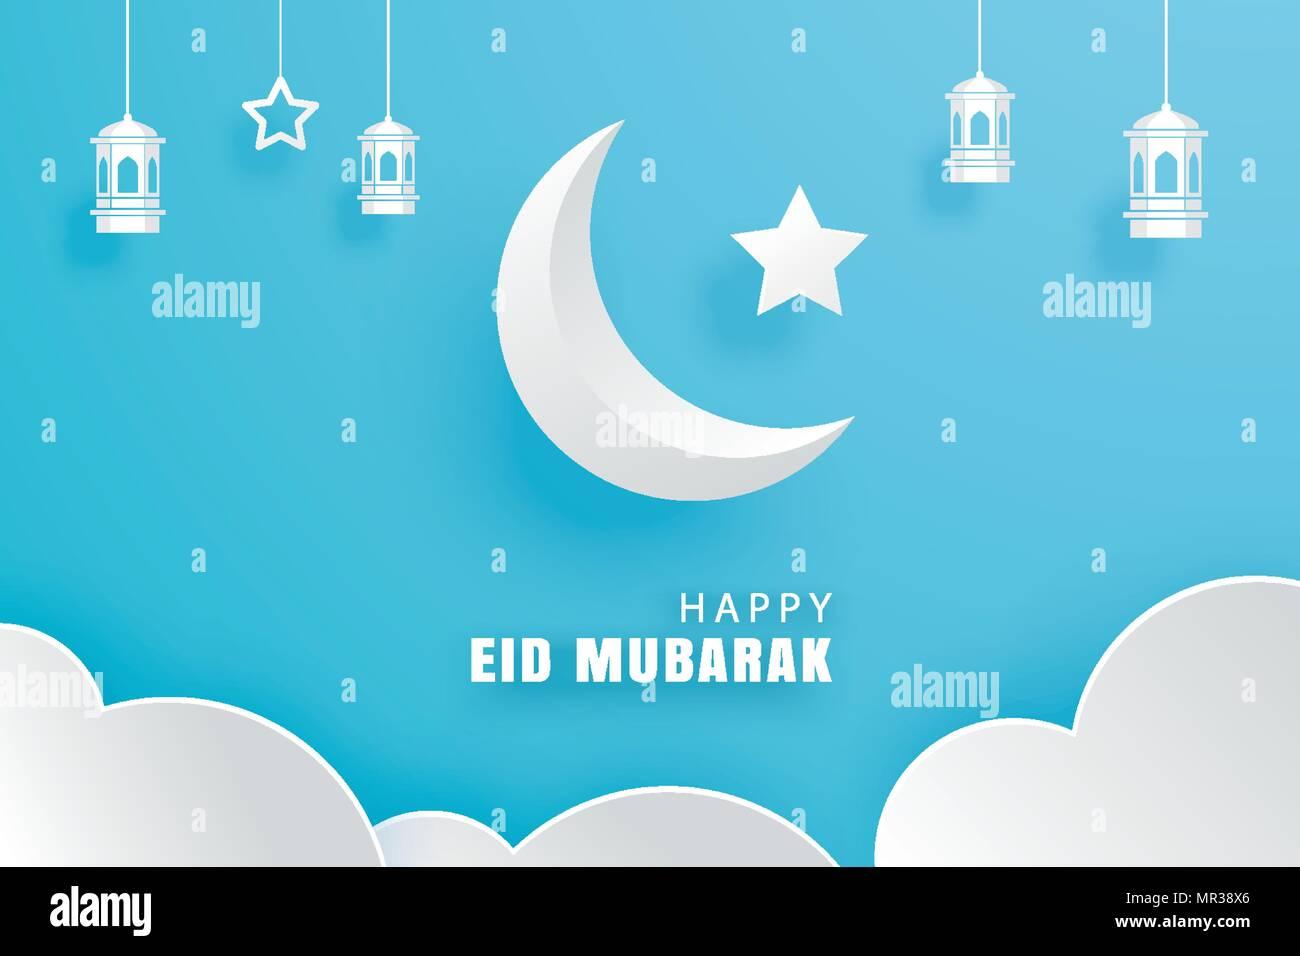 Eid mubarak greeting card stock photos eid mubarak greeting card happy eid mubarak greeting card with with crescent moon paper art background ramadan kareem vector m4hsunfo